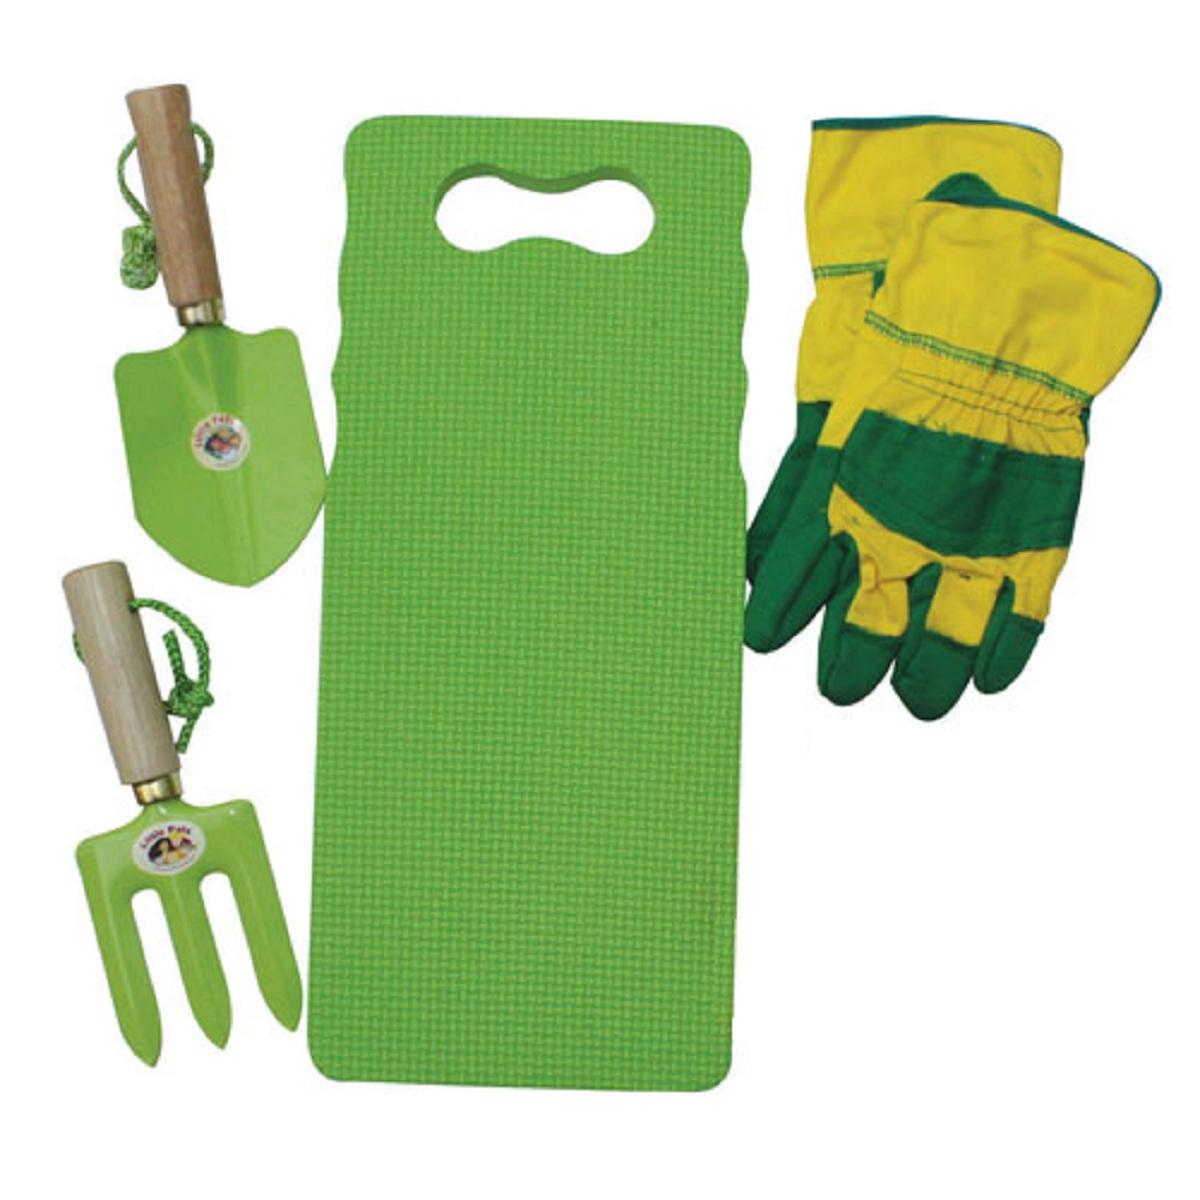 Childrens Green Activity Gardening Kit Garden Tools For